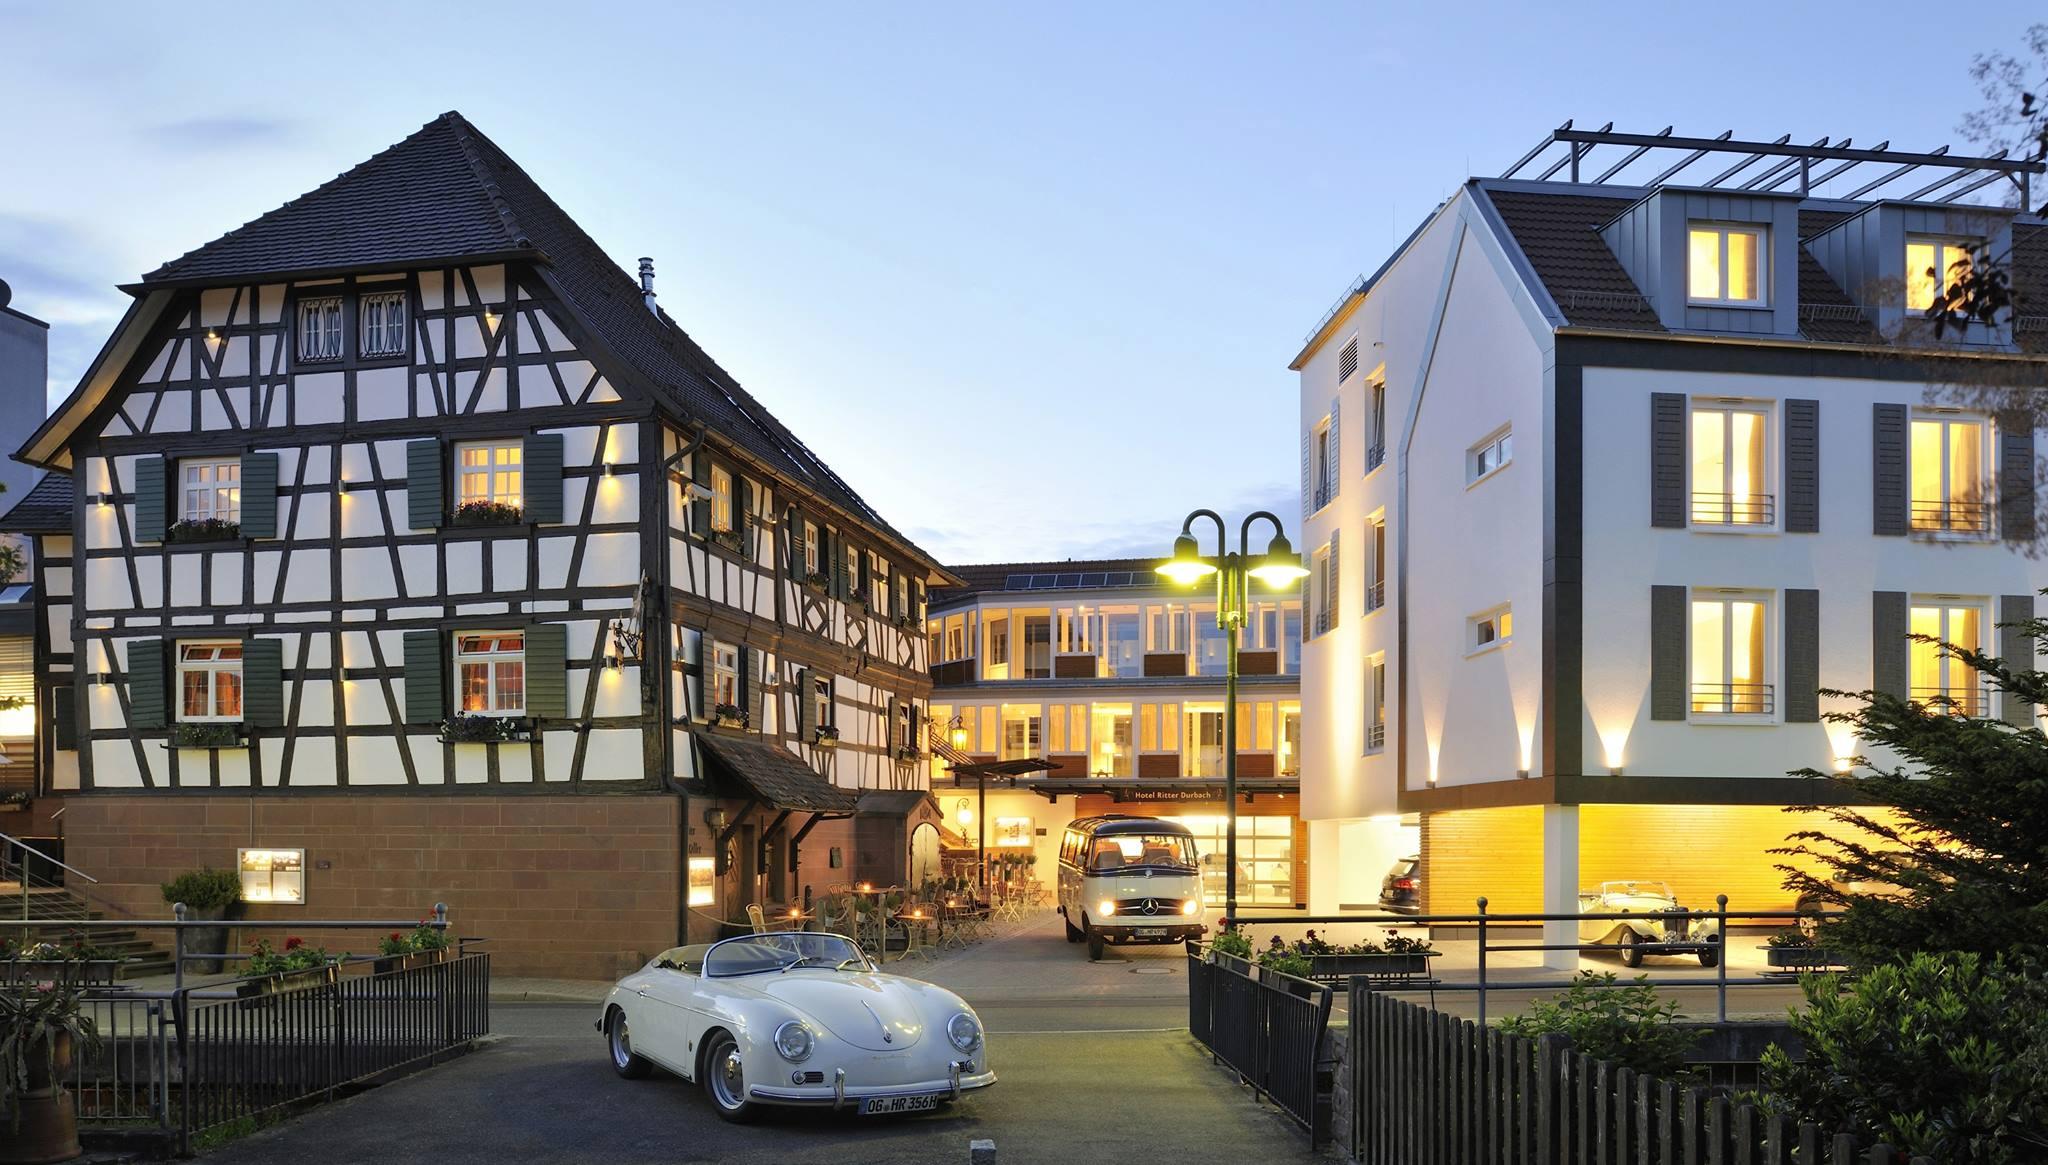 Hotel Ritter in Durbach